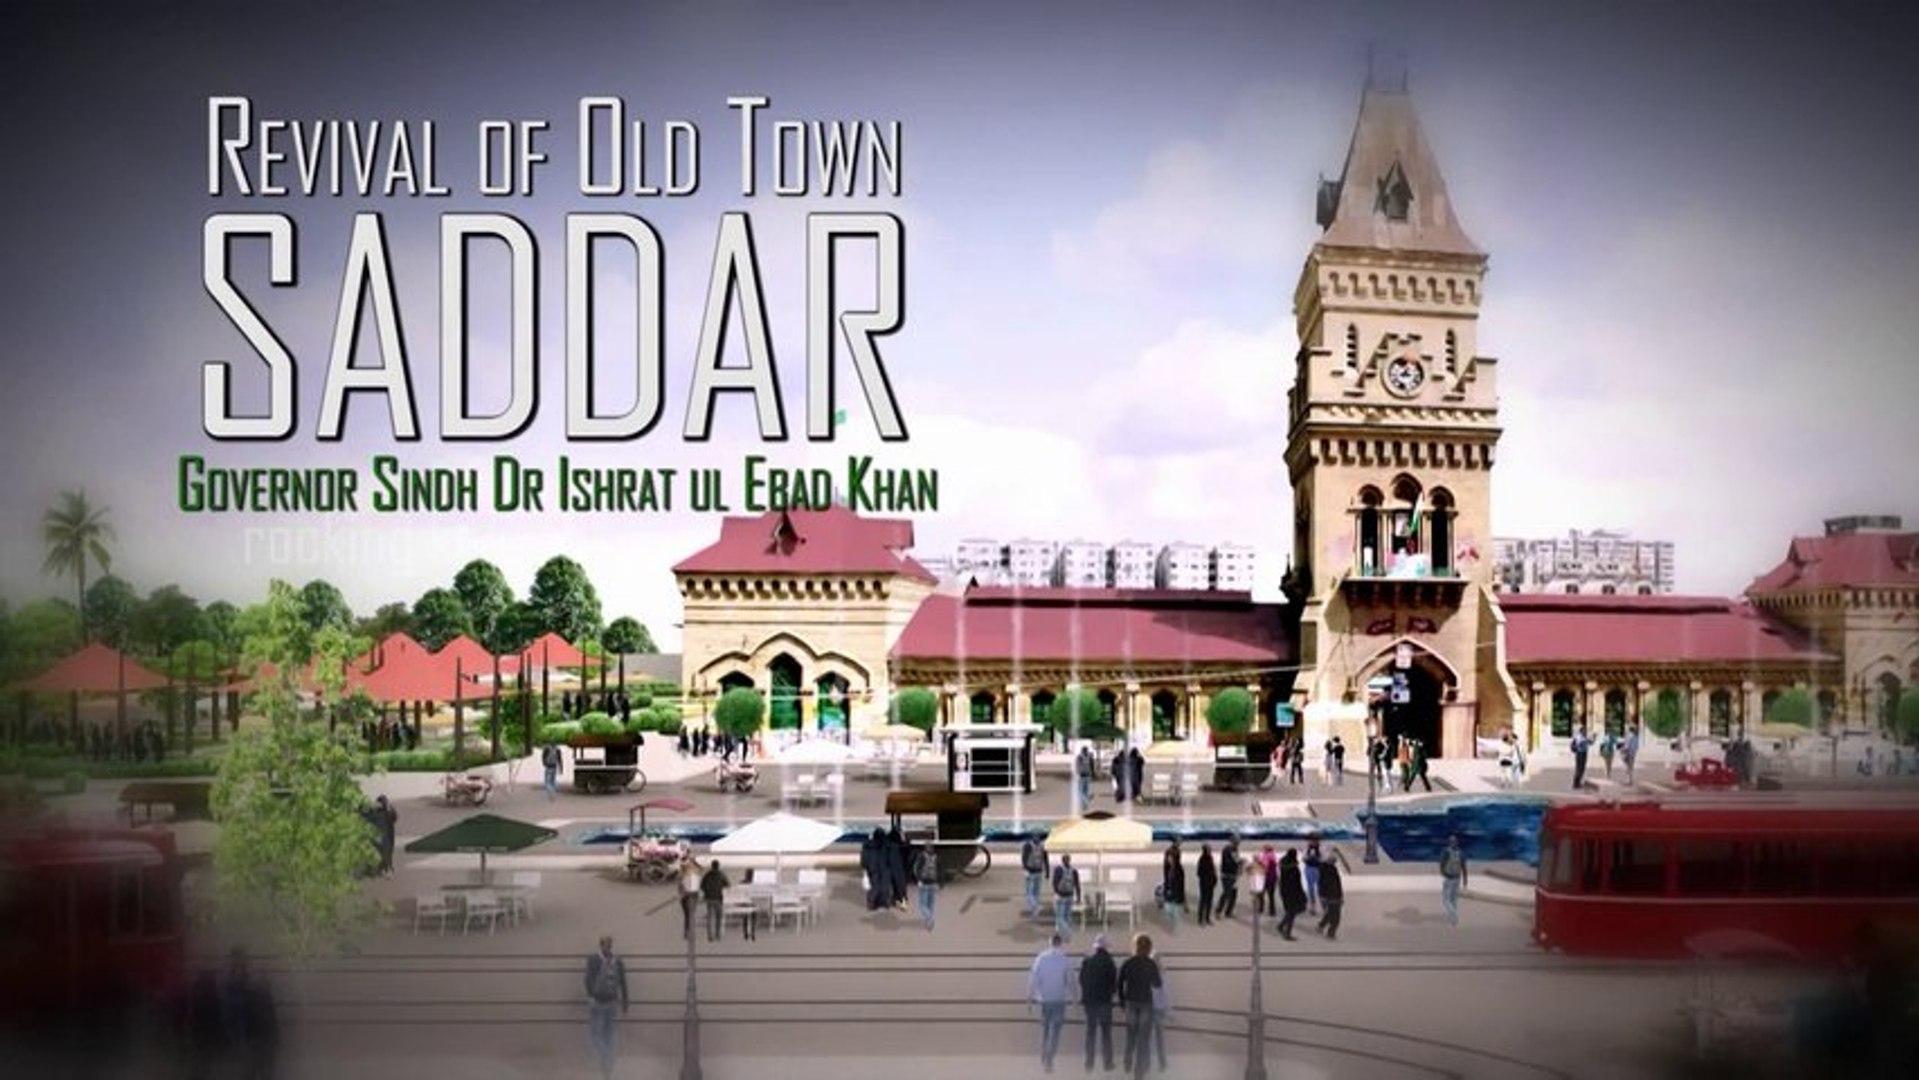 Revival of old Town Saddar, Karachi